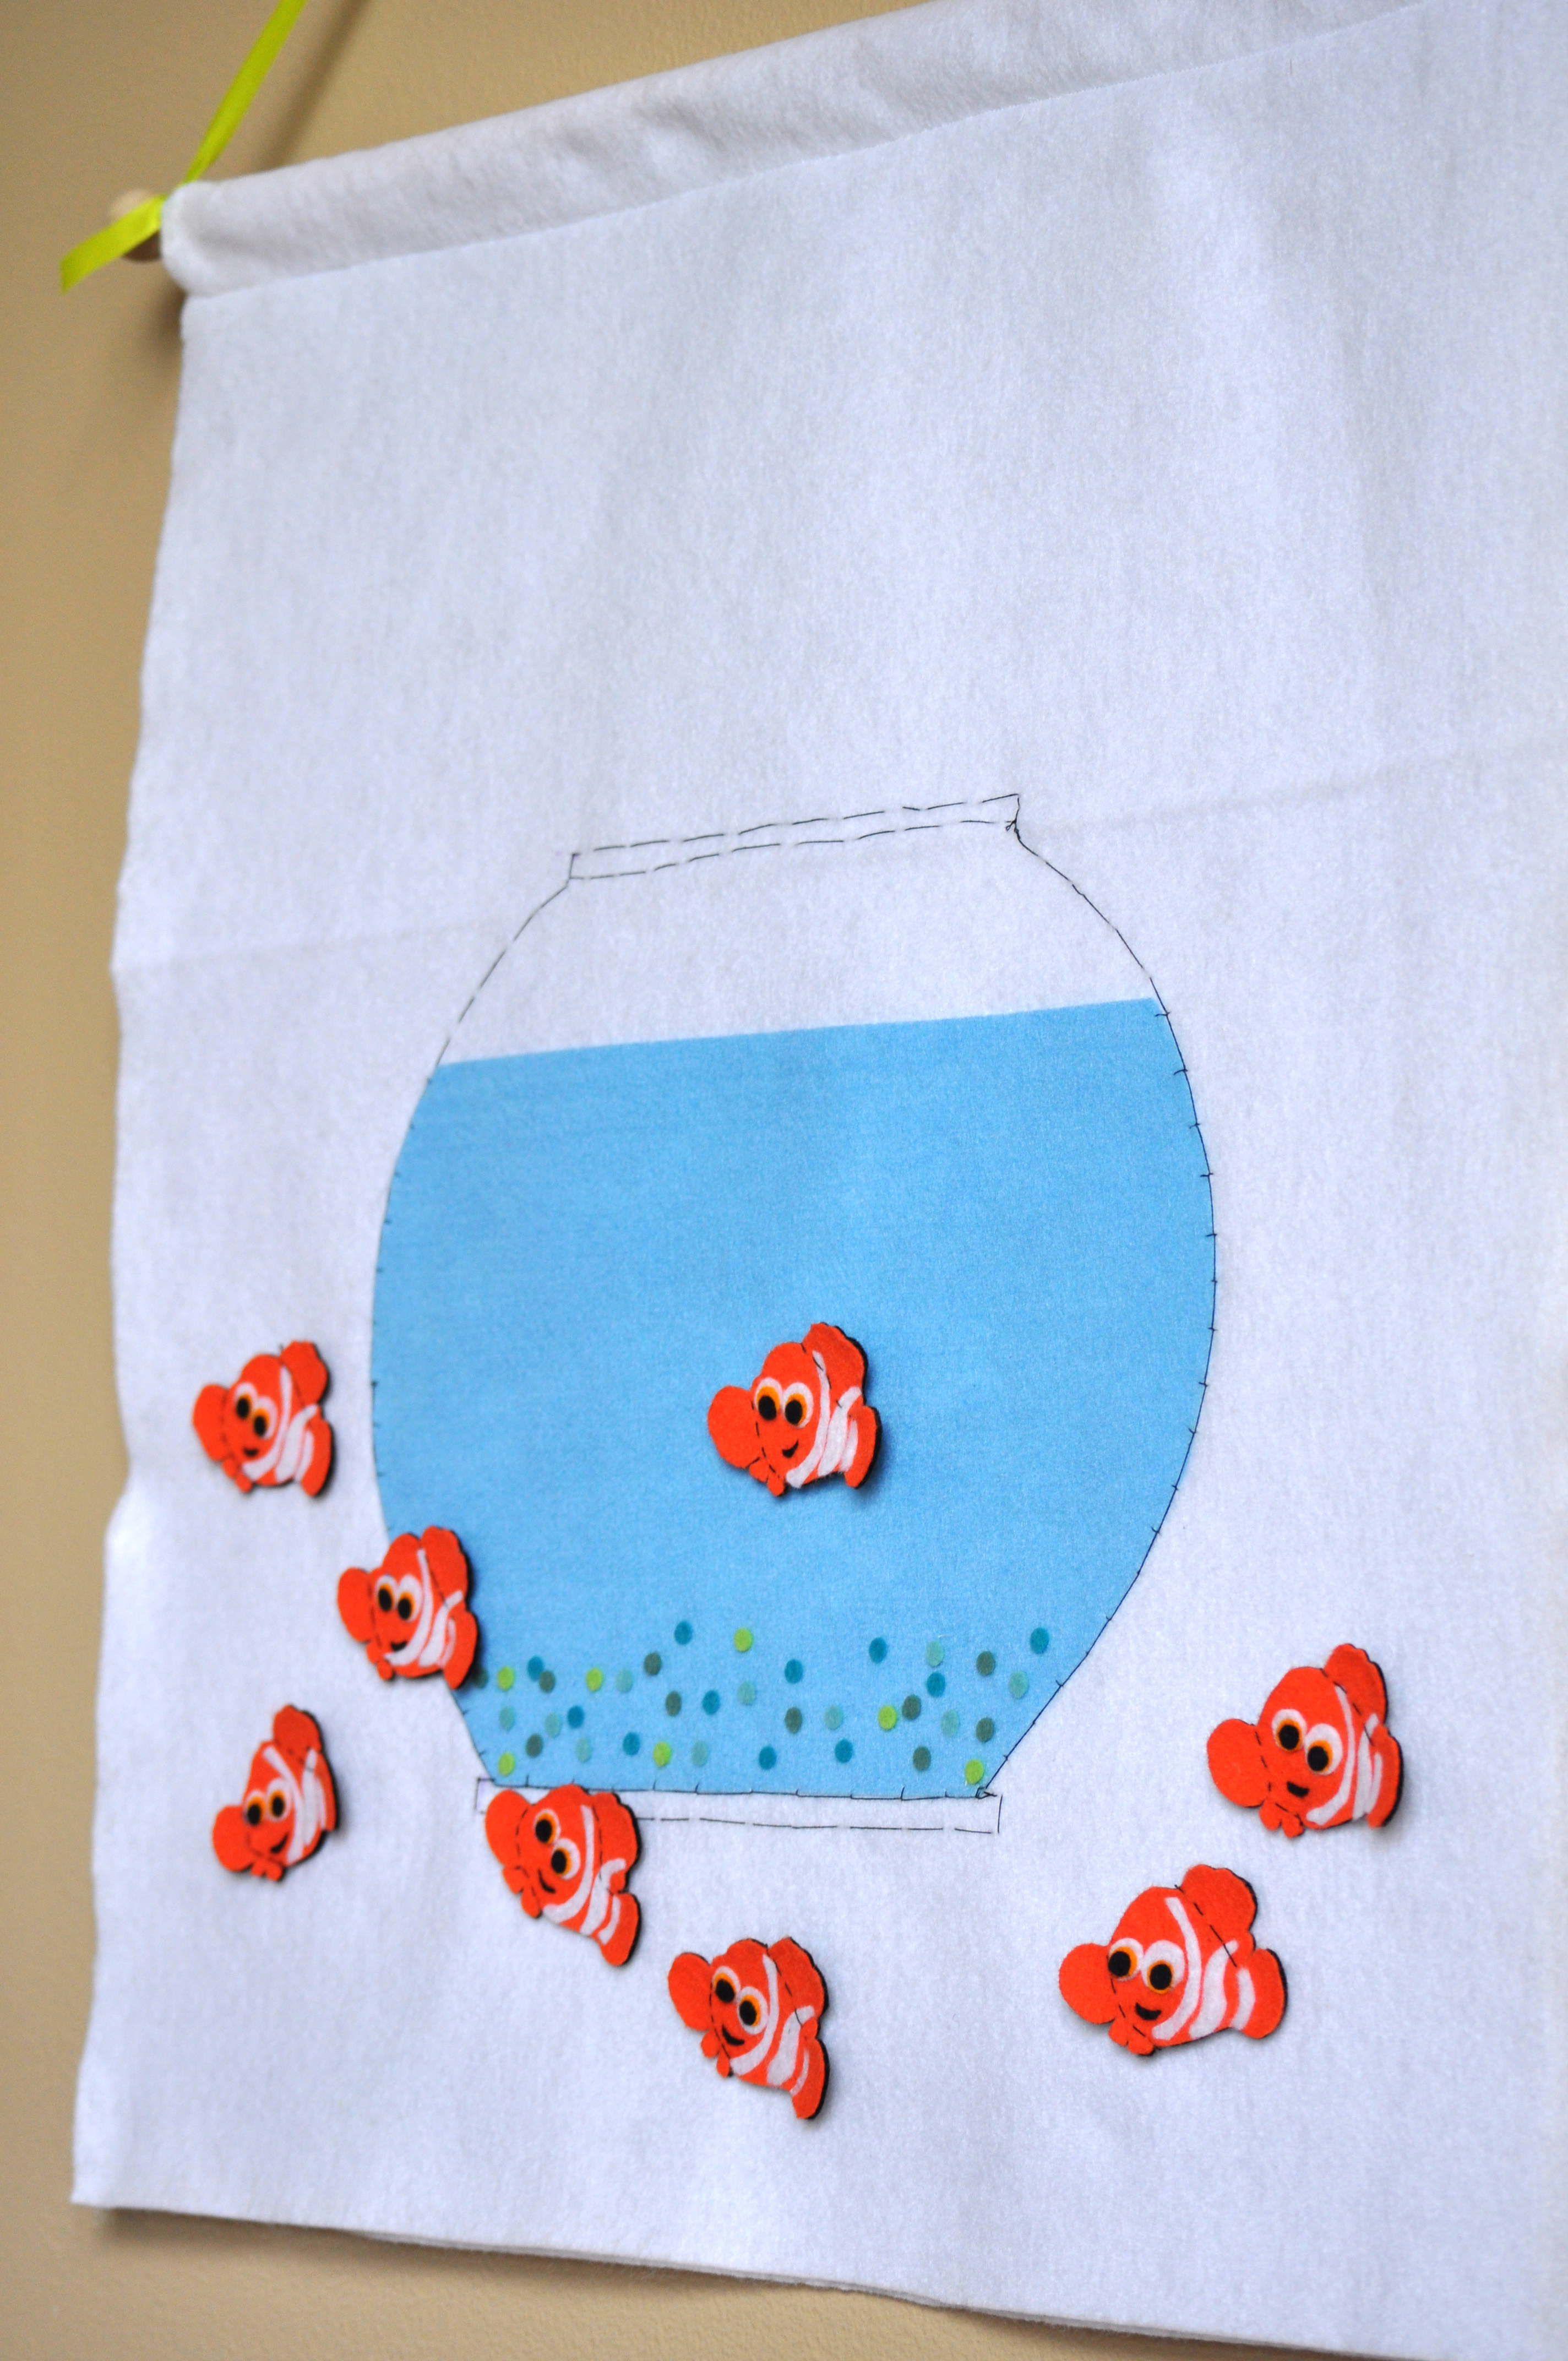 For Maureen Pin Nemo On The Fish Bowl